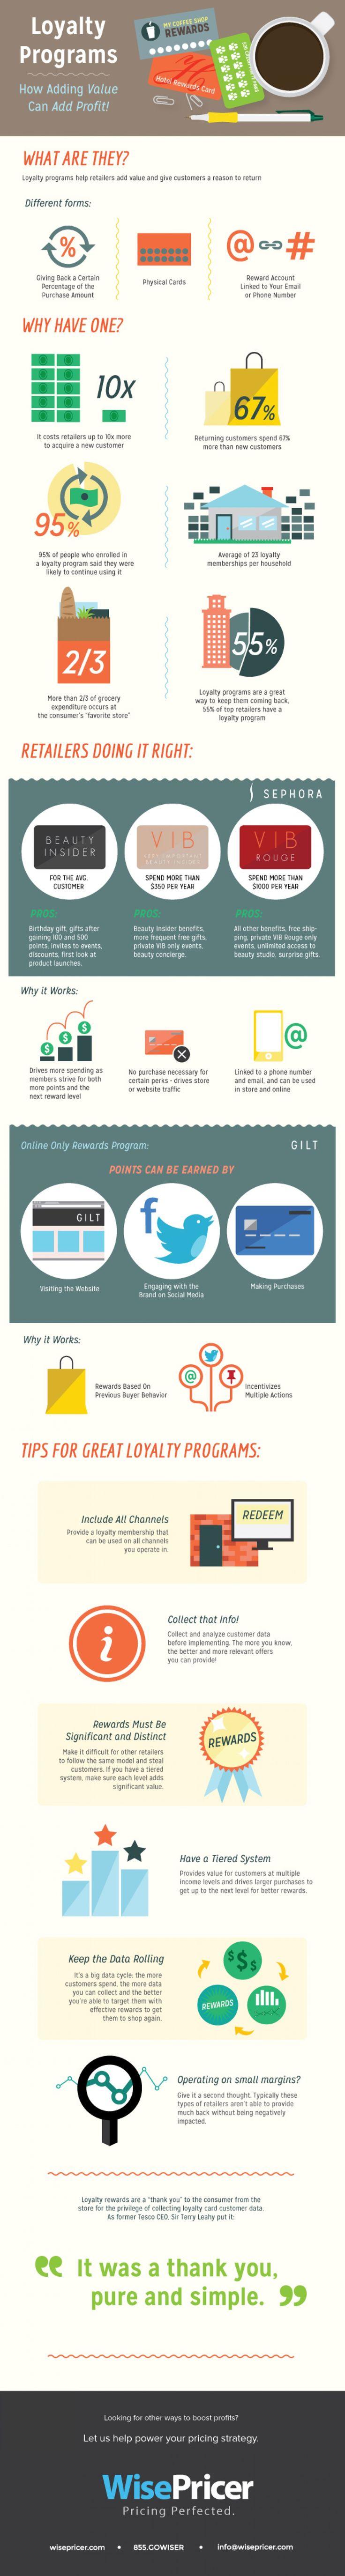 41 best loyalty program images on pinterest infographic info loyalty programs infographic colourmoves Gallery